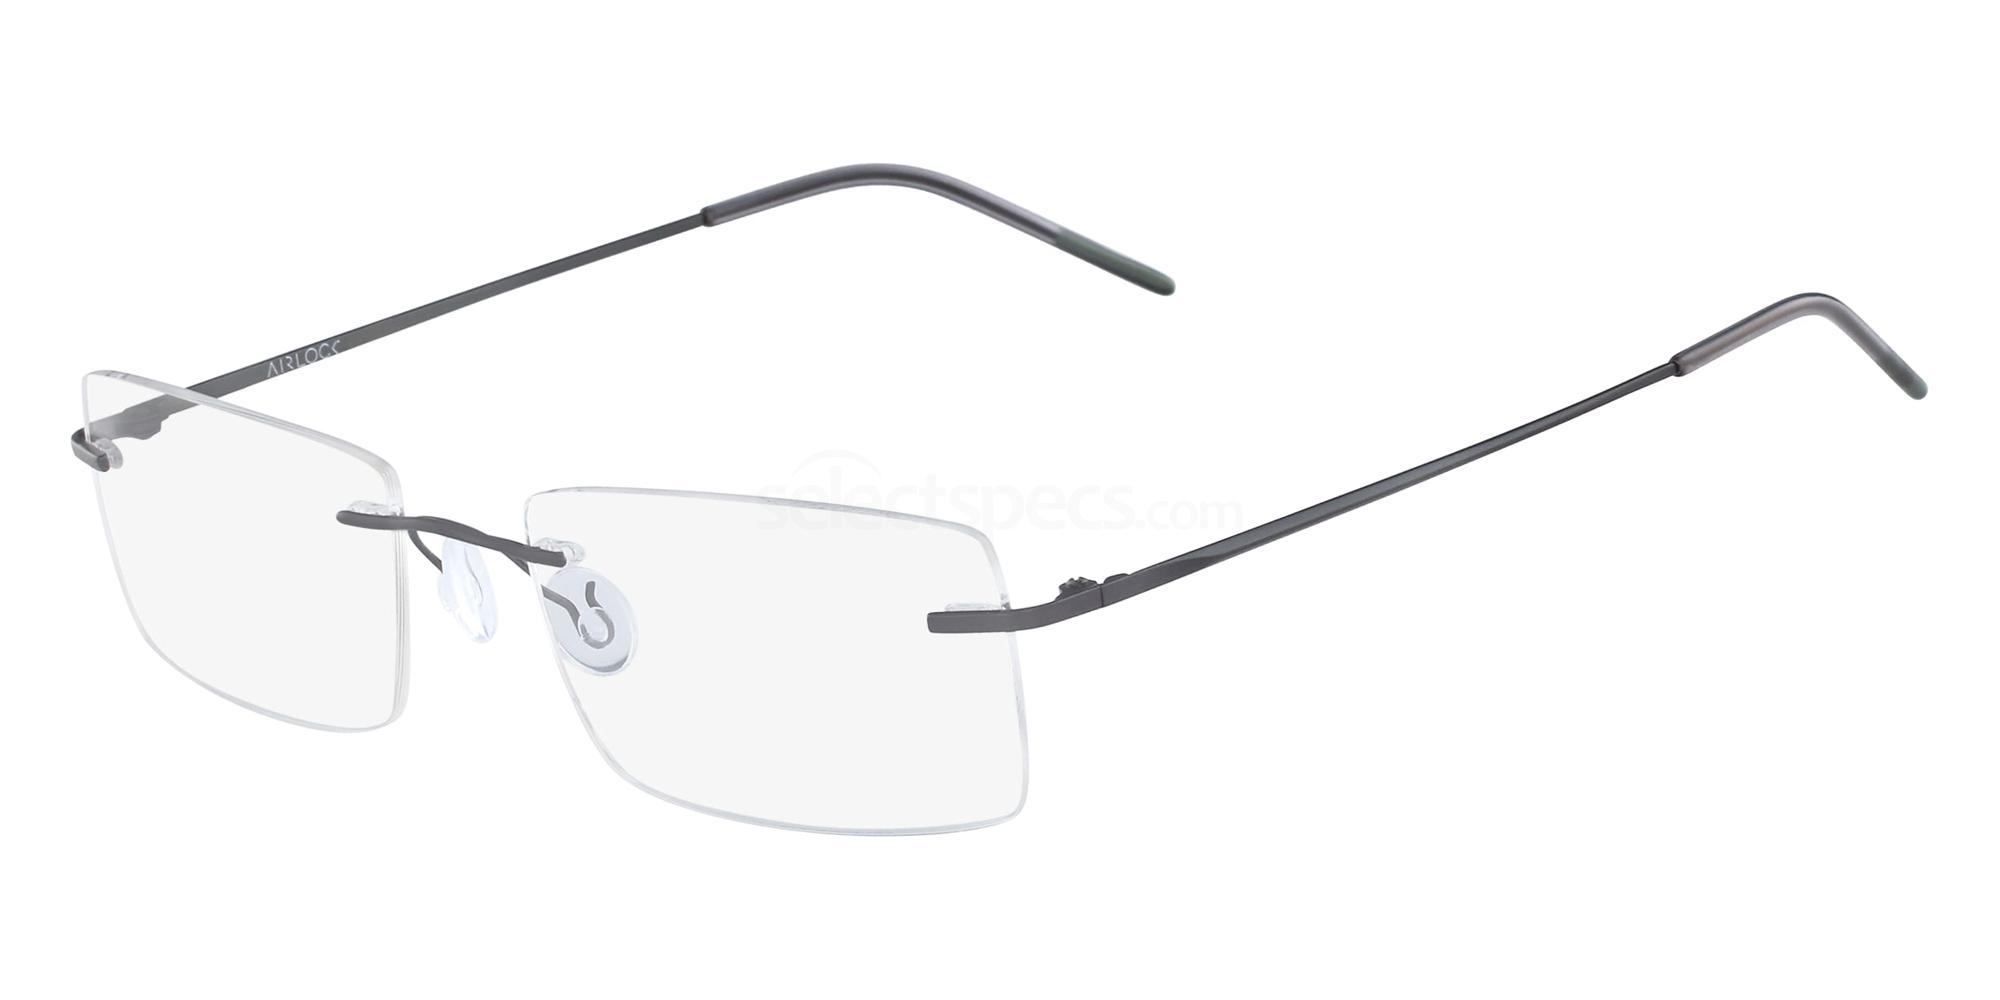 035 WISDOM 205 Glasses, AIRLOCK